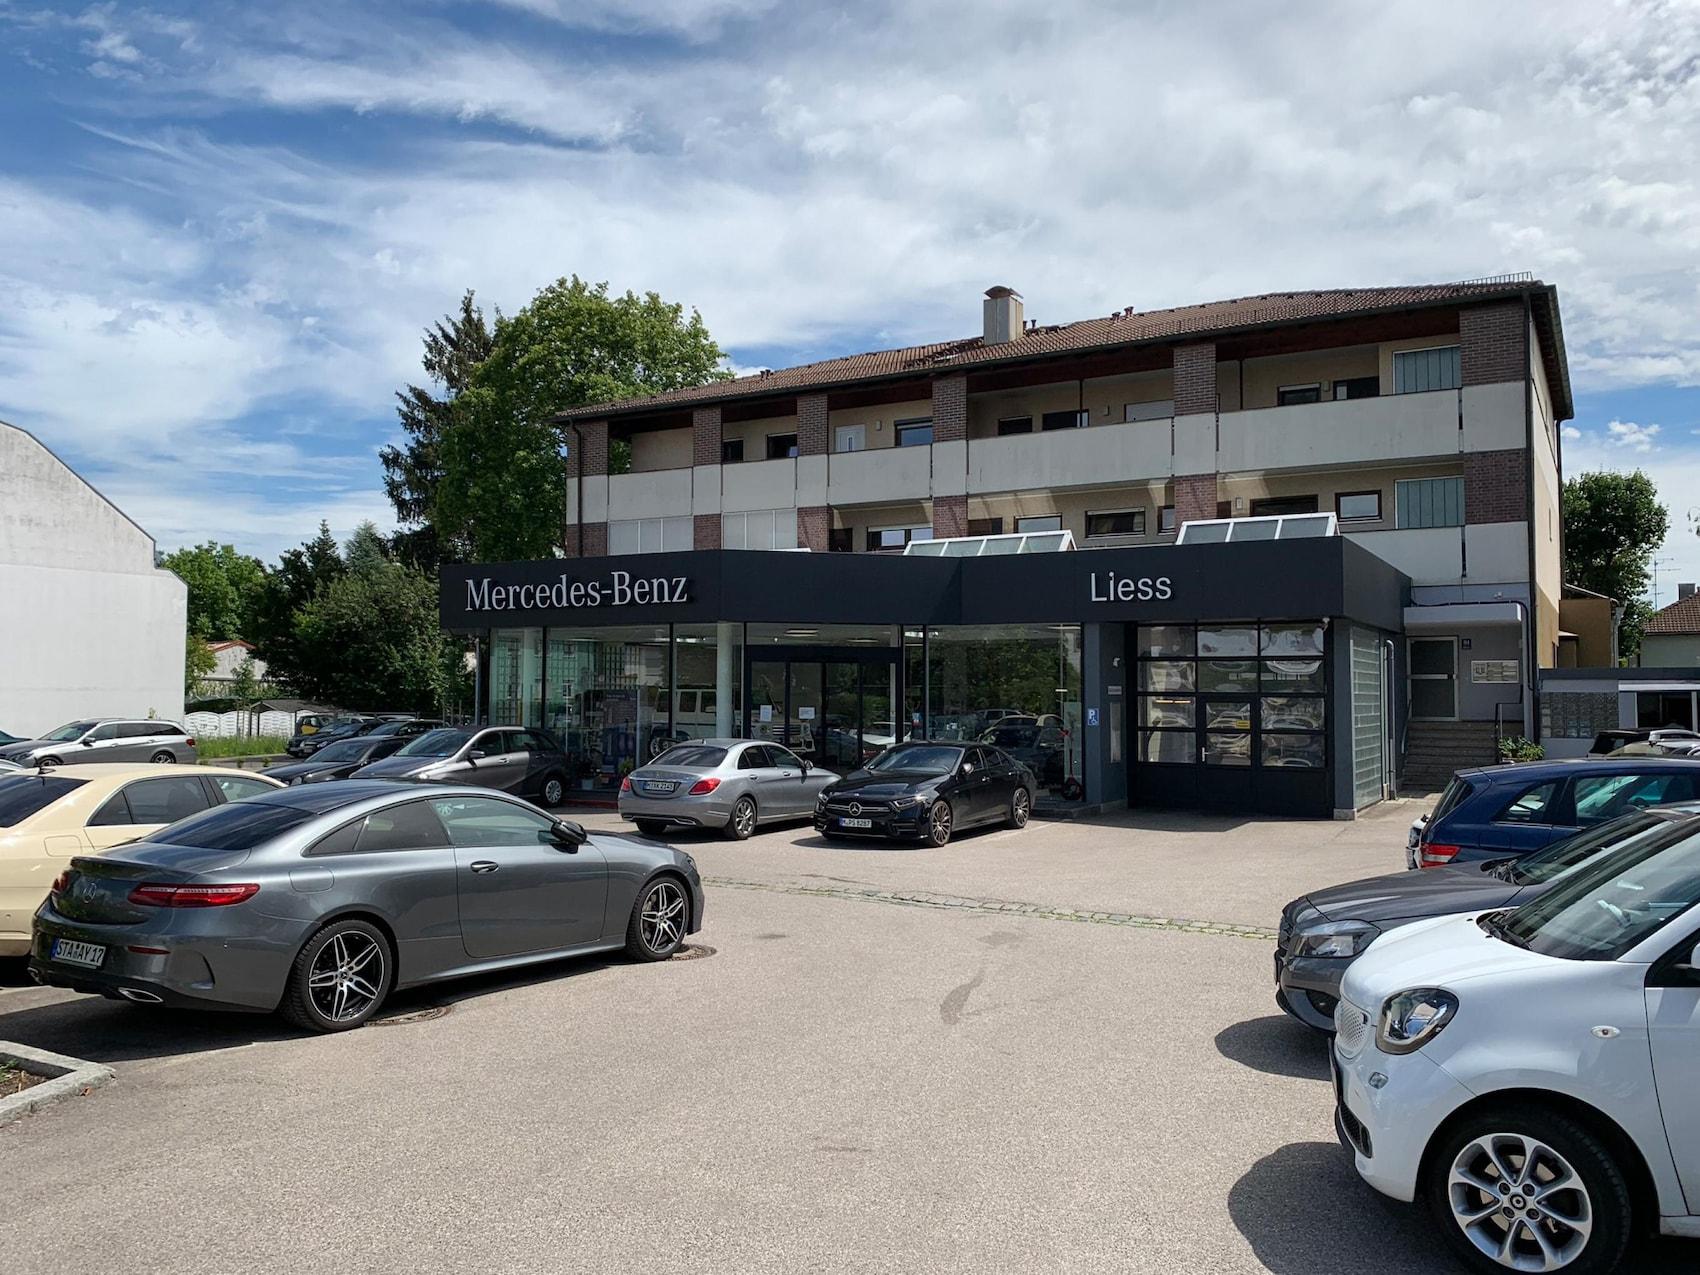 sSP-Autohaus-Liess-Home-Standort